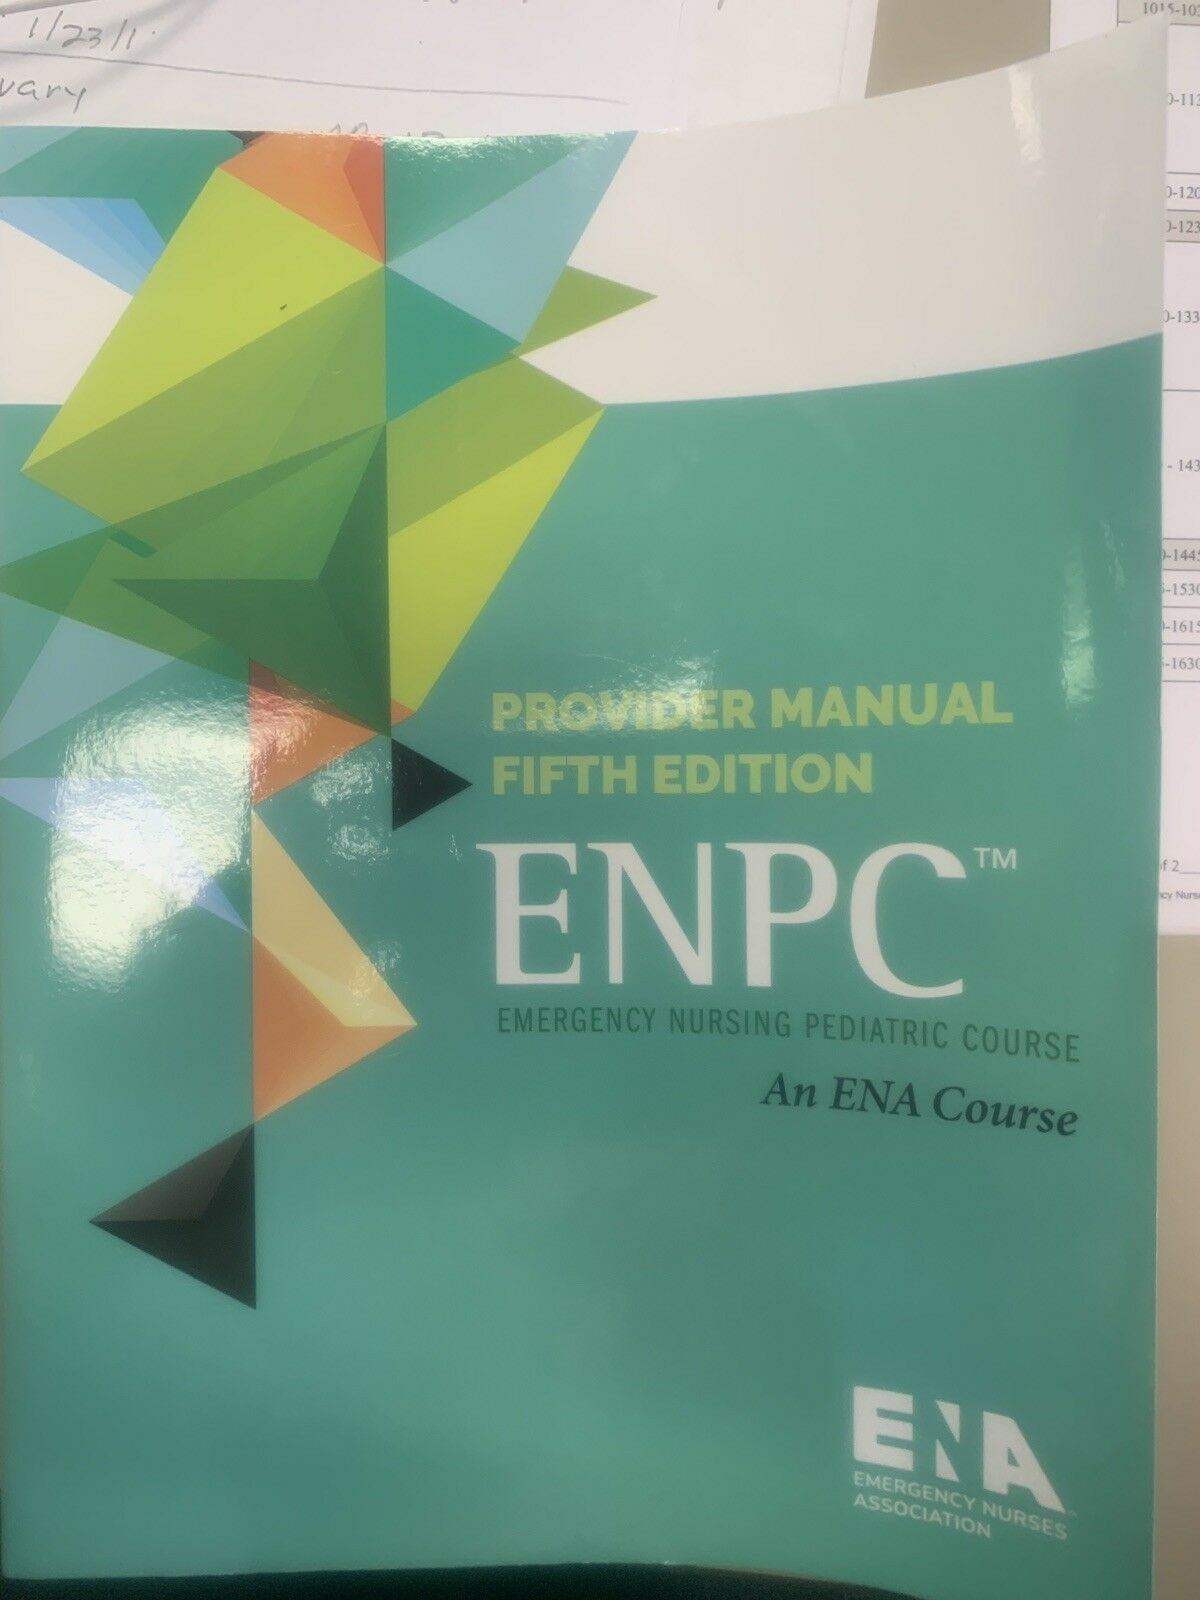 Ena ENPC Provider Manual 5th Edition